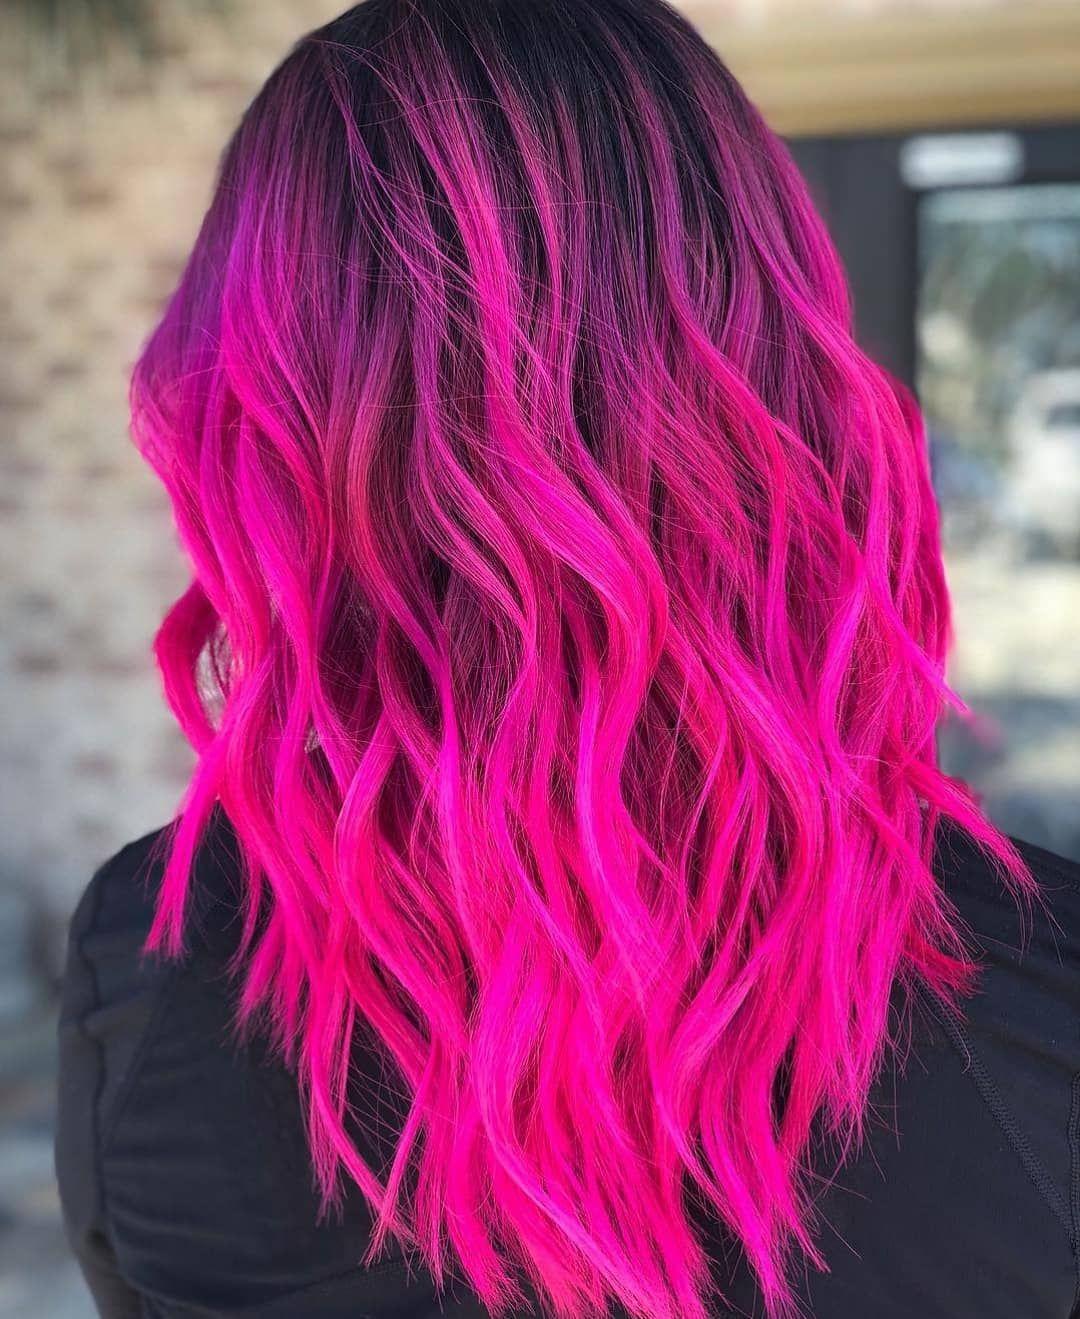 Coloridosbr Hair Styles Vivid Hair Color Bright Hair Colors